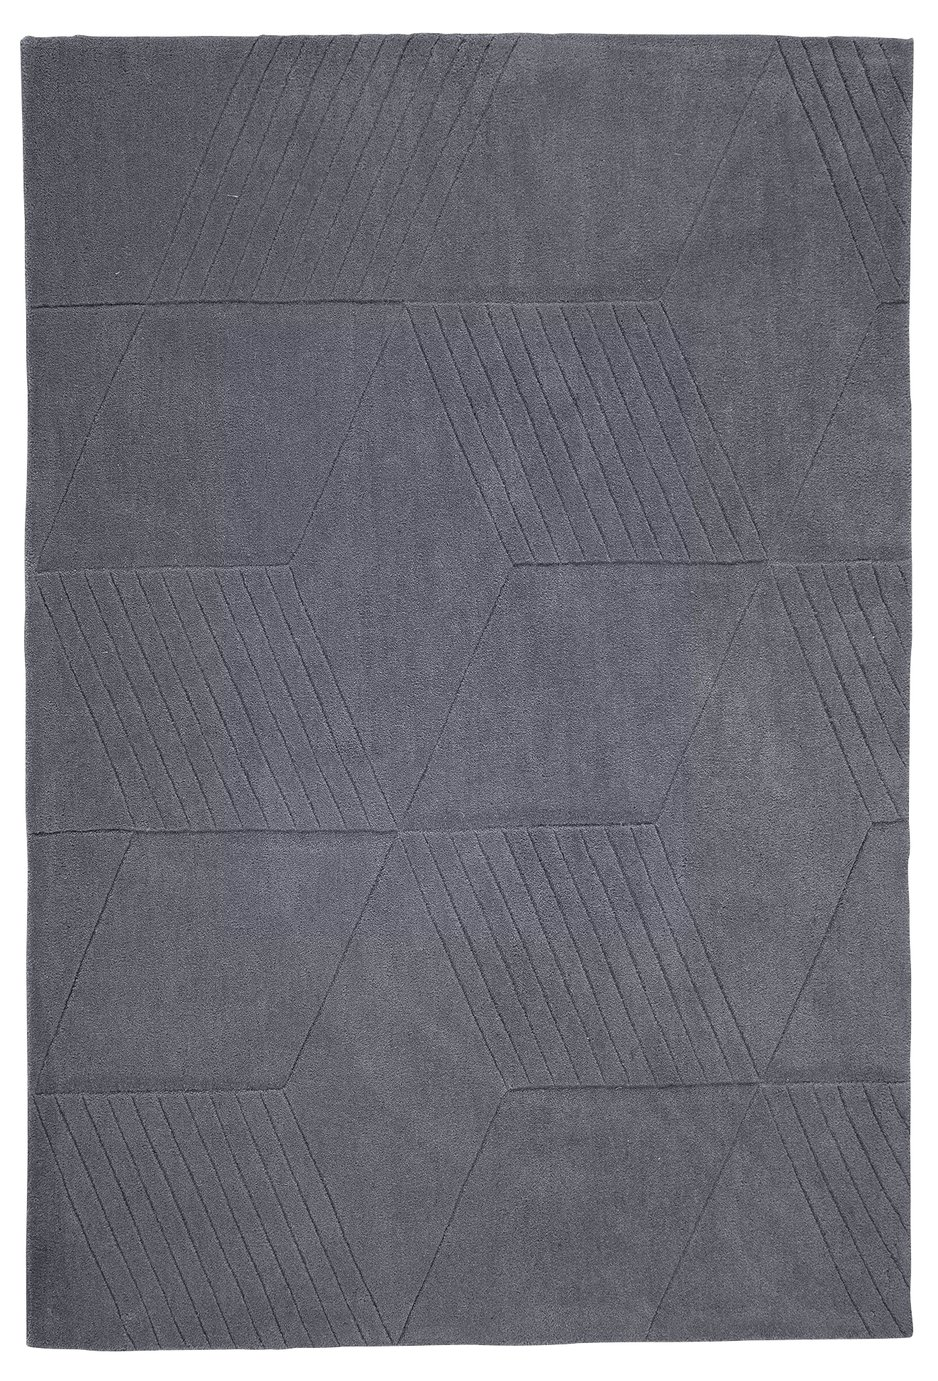 Argos Home Lawson Geometric Rug review